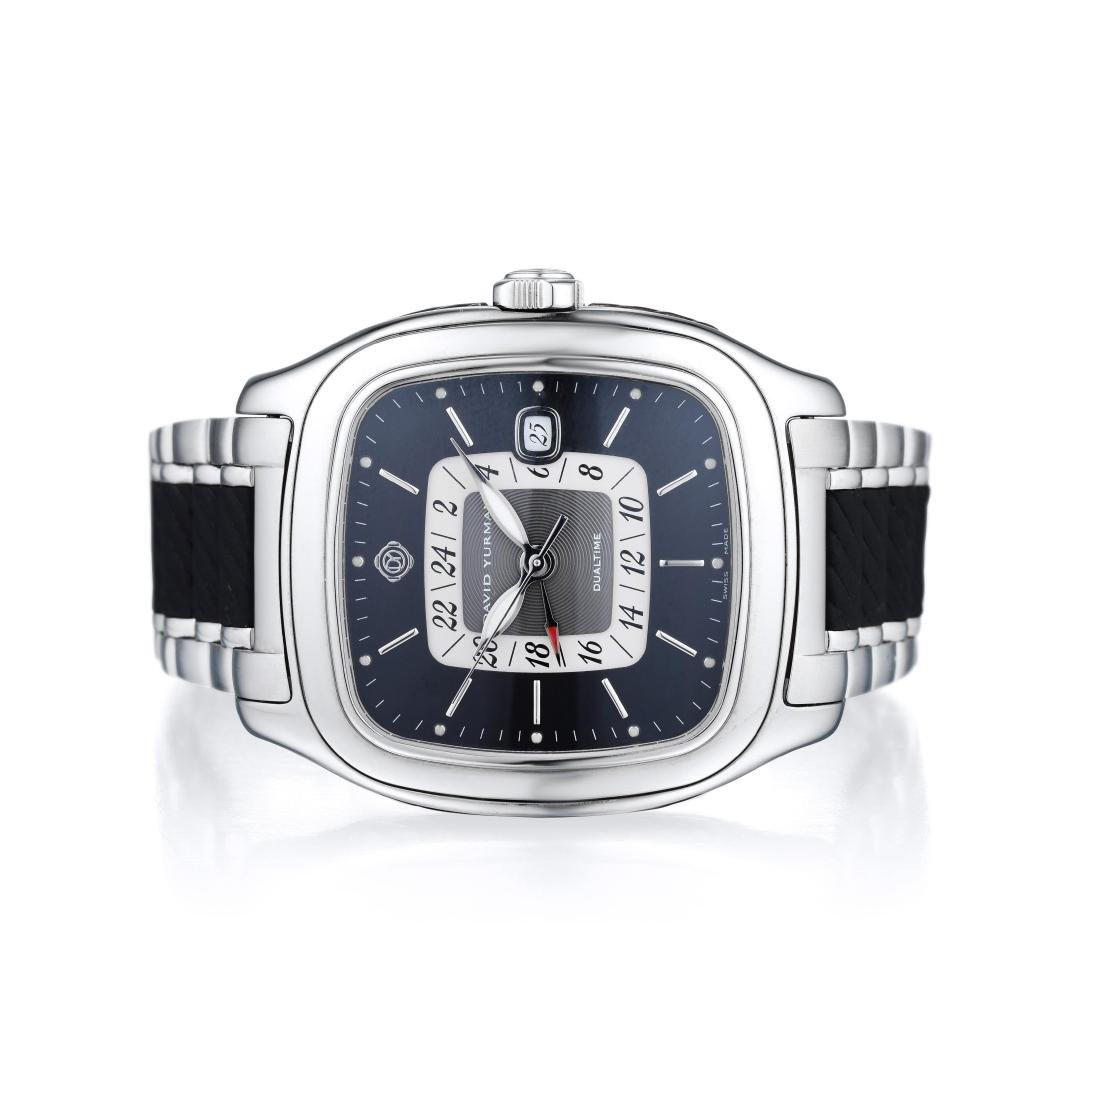 David Yurman Thoroughbred Gents Stainless Steel Watch